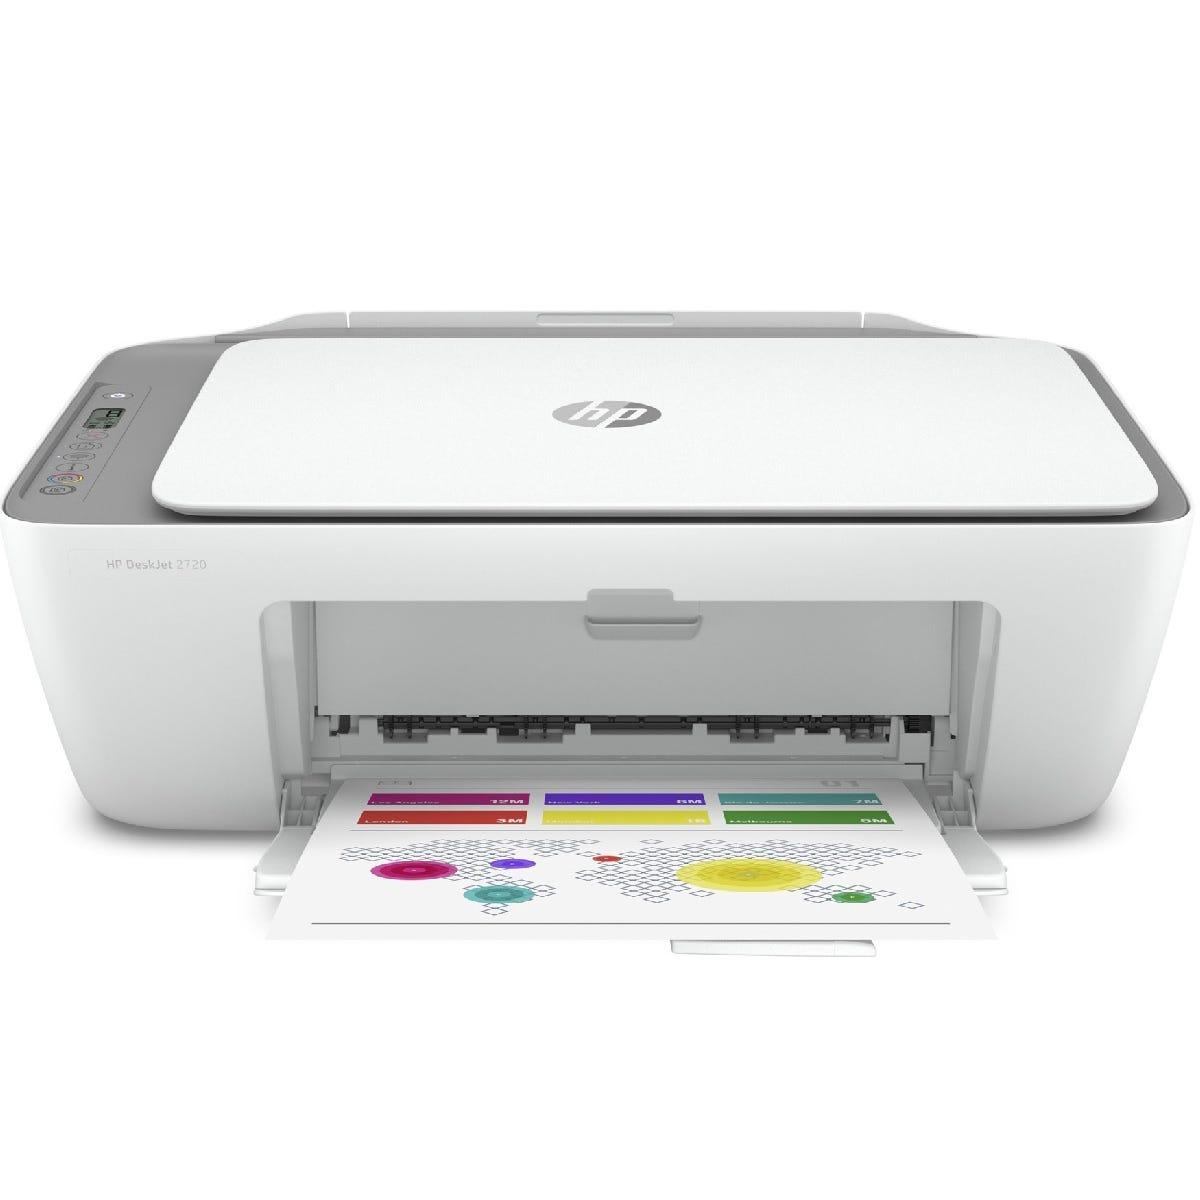 HP Deskjet 2720 Wireless All-in-One Printer - Cement Grey/White